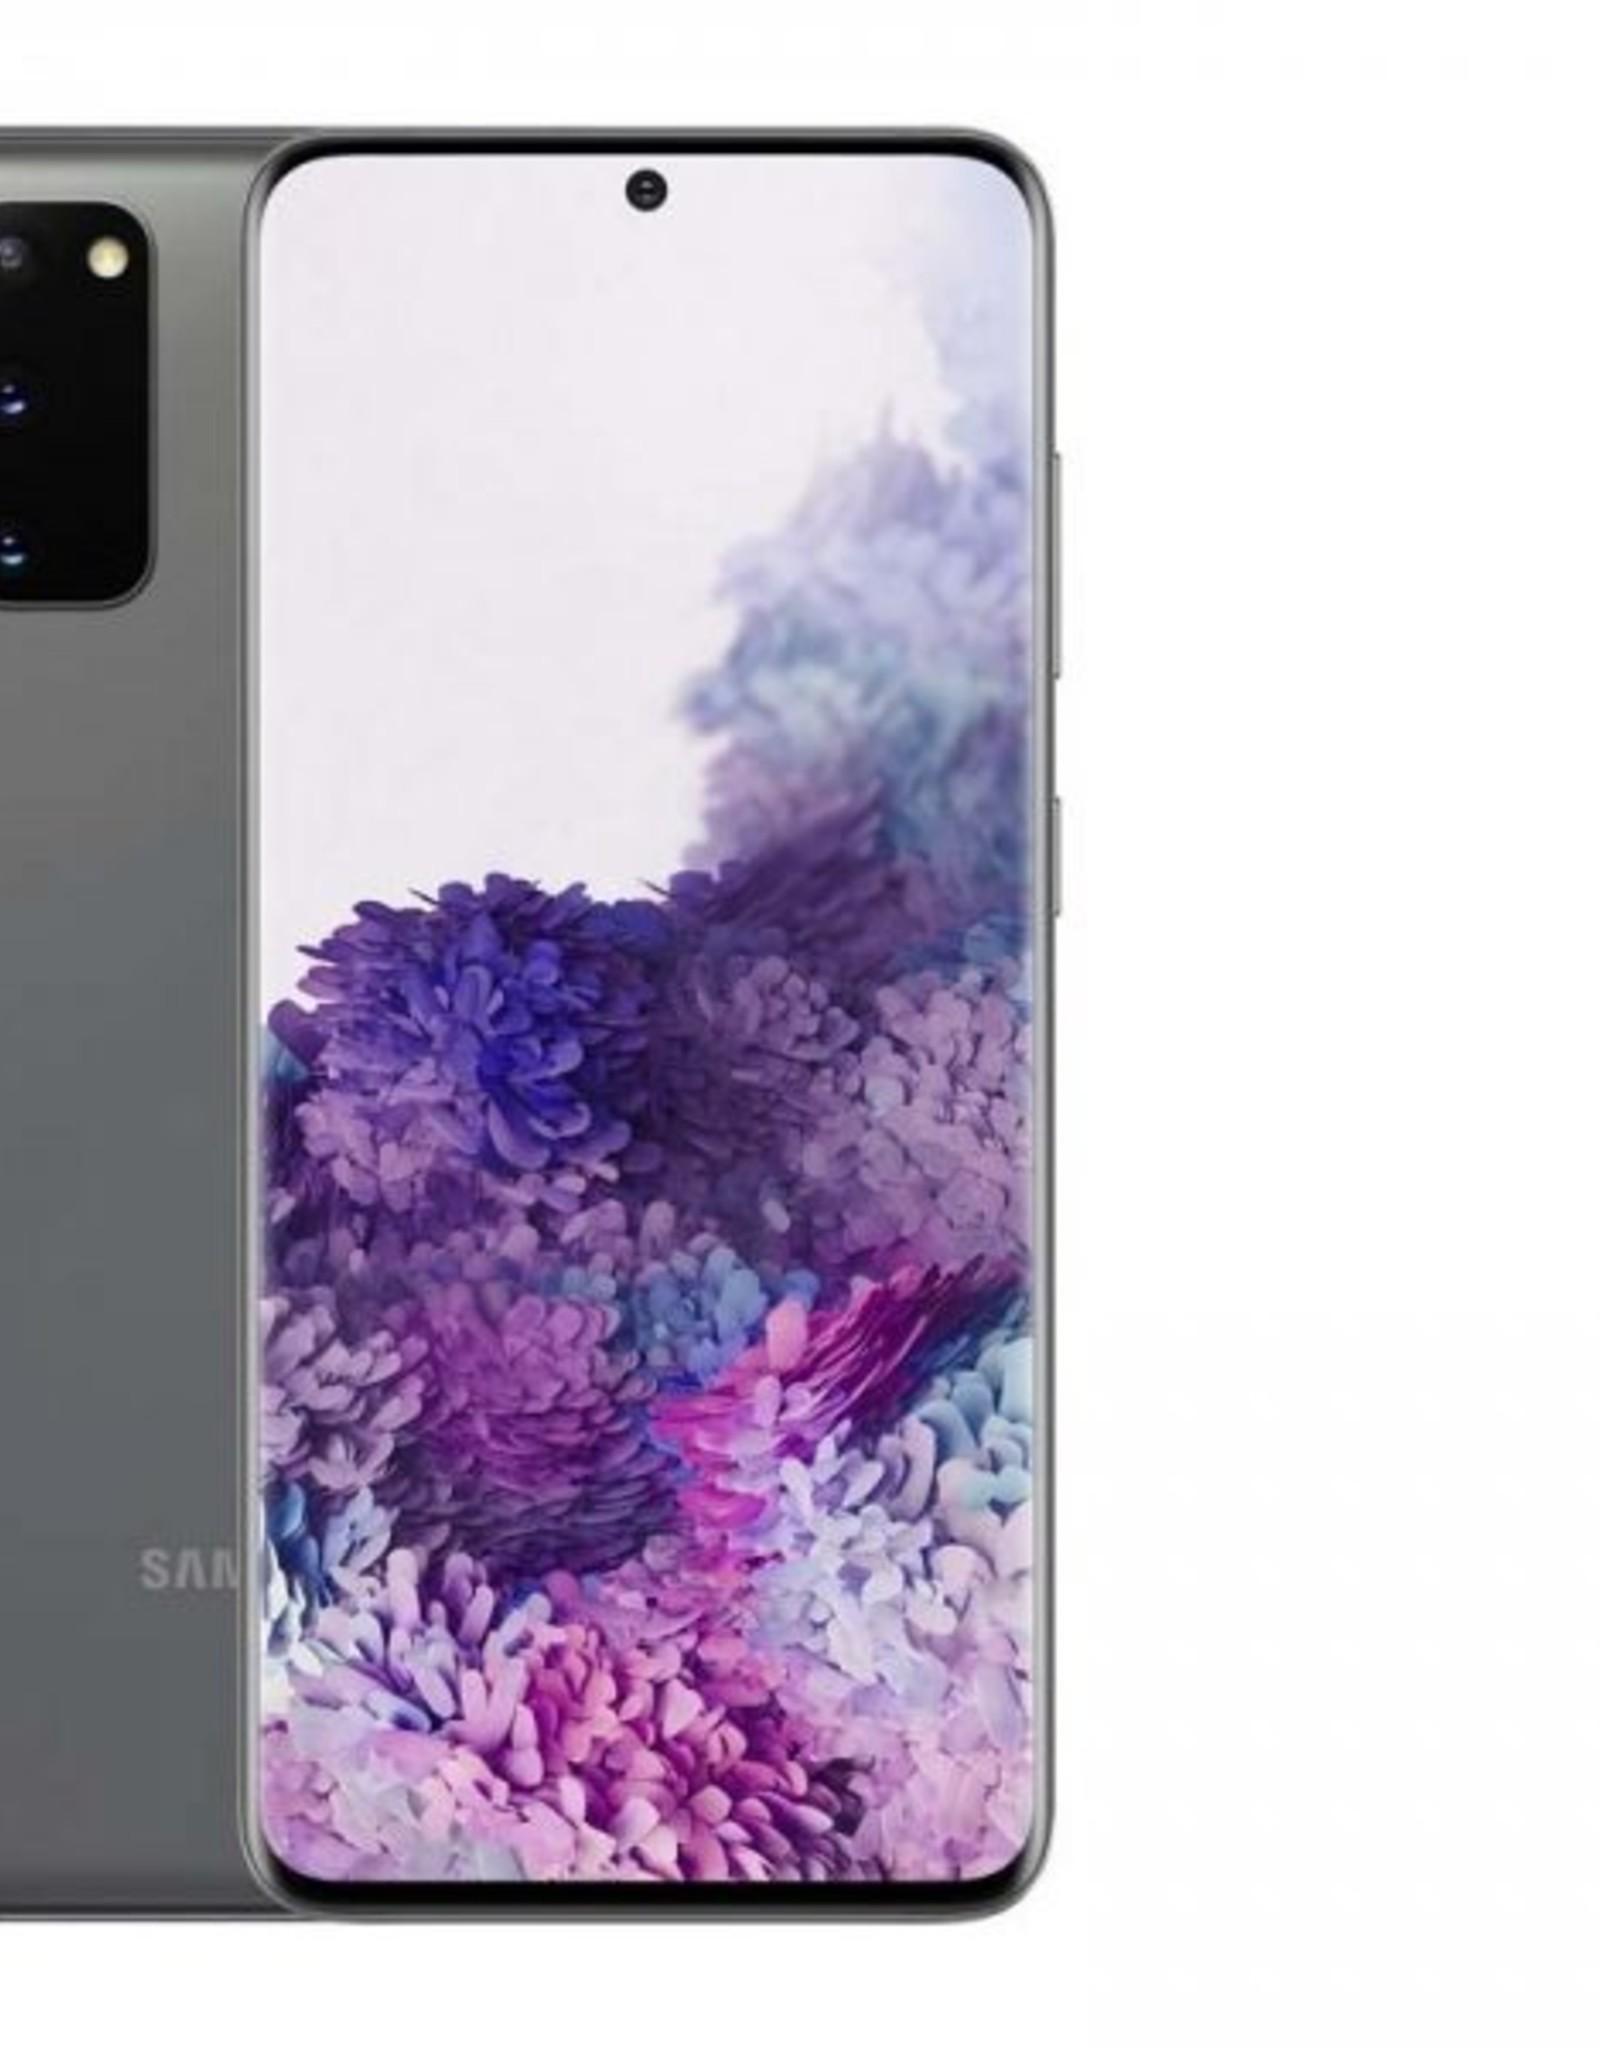 Samsung Samsung Galaxy S20 ULTRA 5G Dual Sim G988F 512GB Cosmic Gray